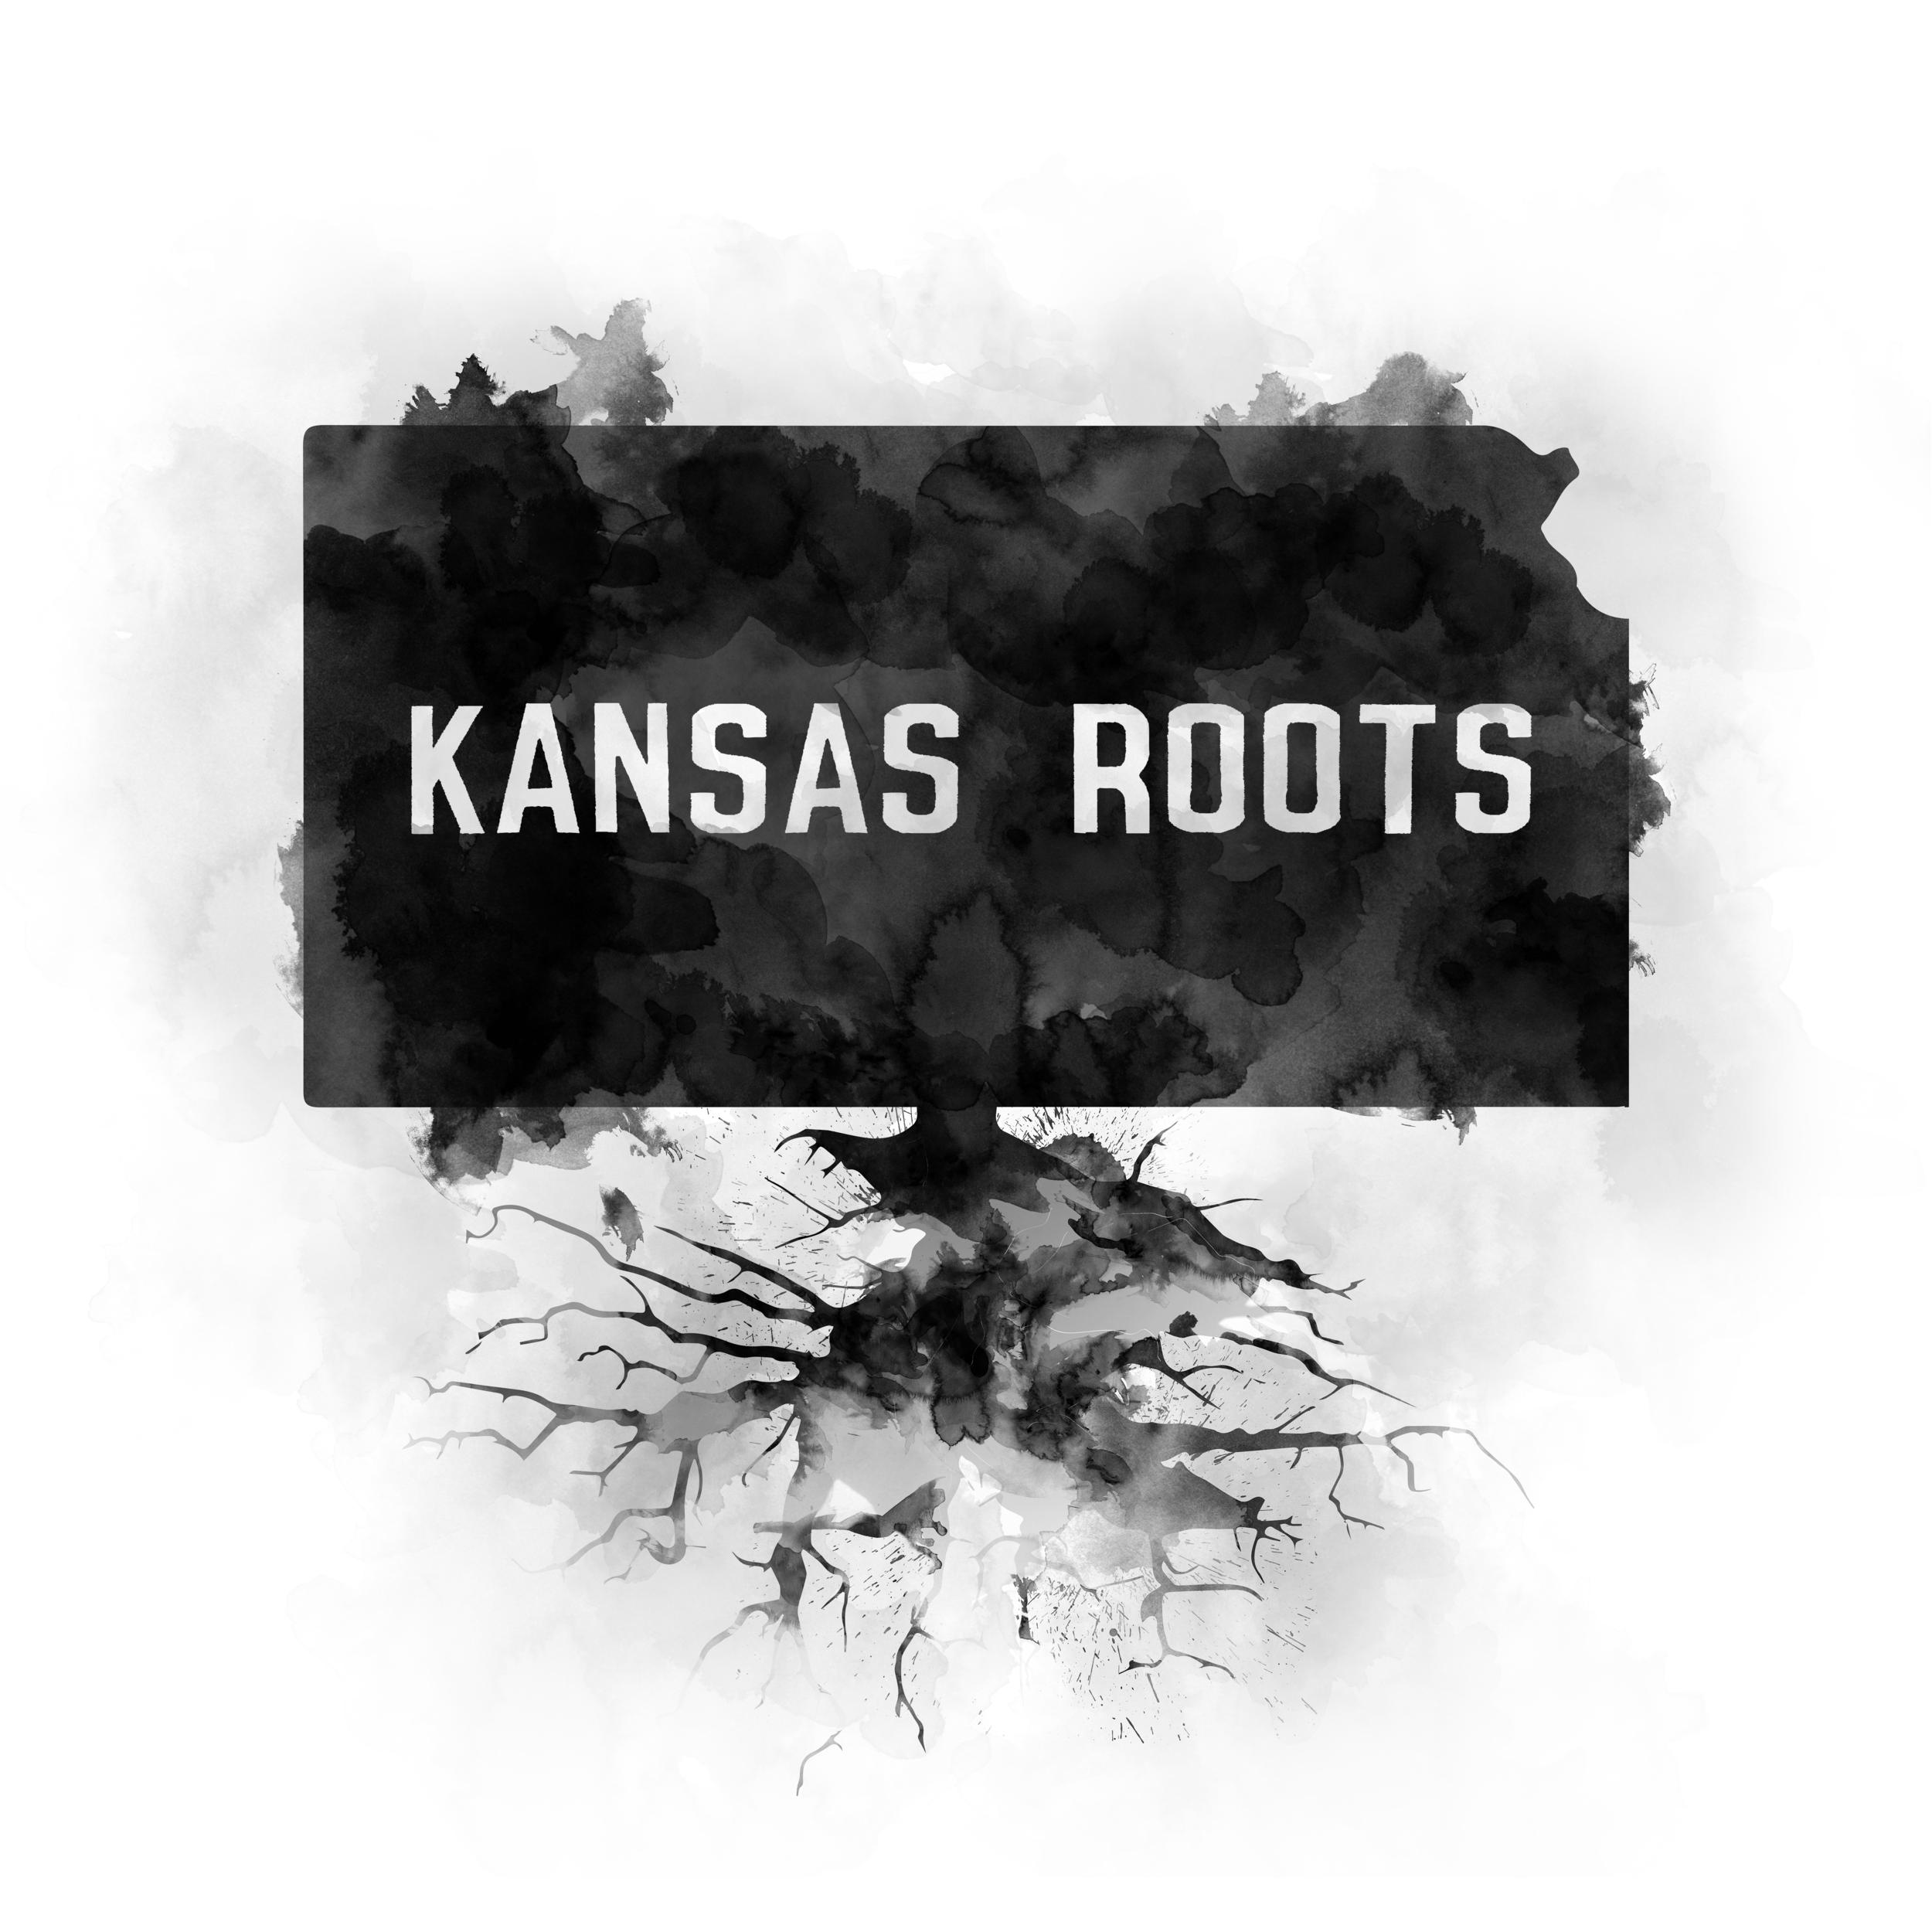 KansasRoots4.png